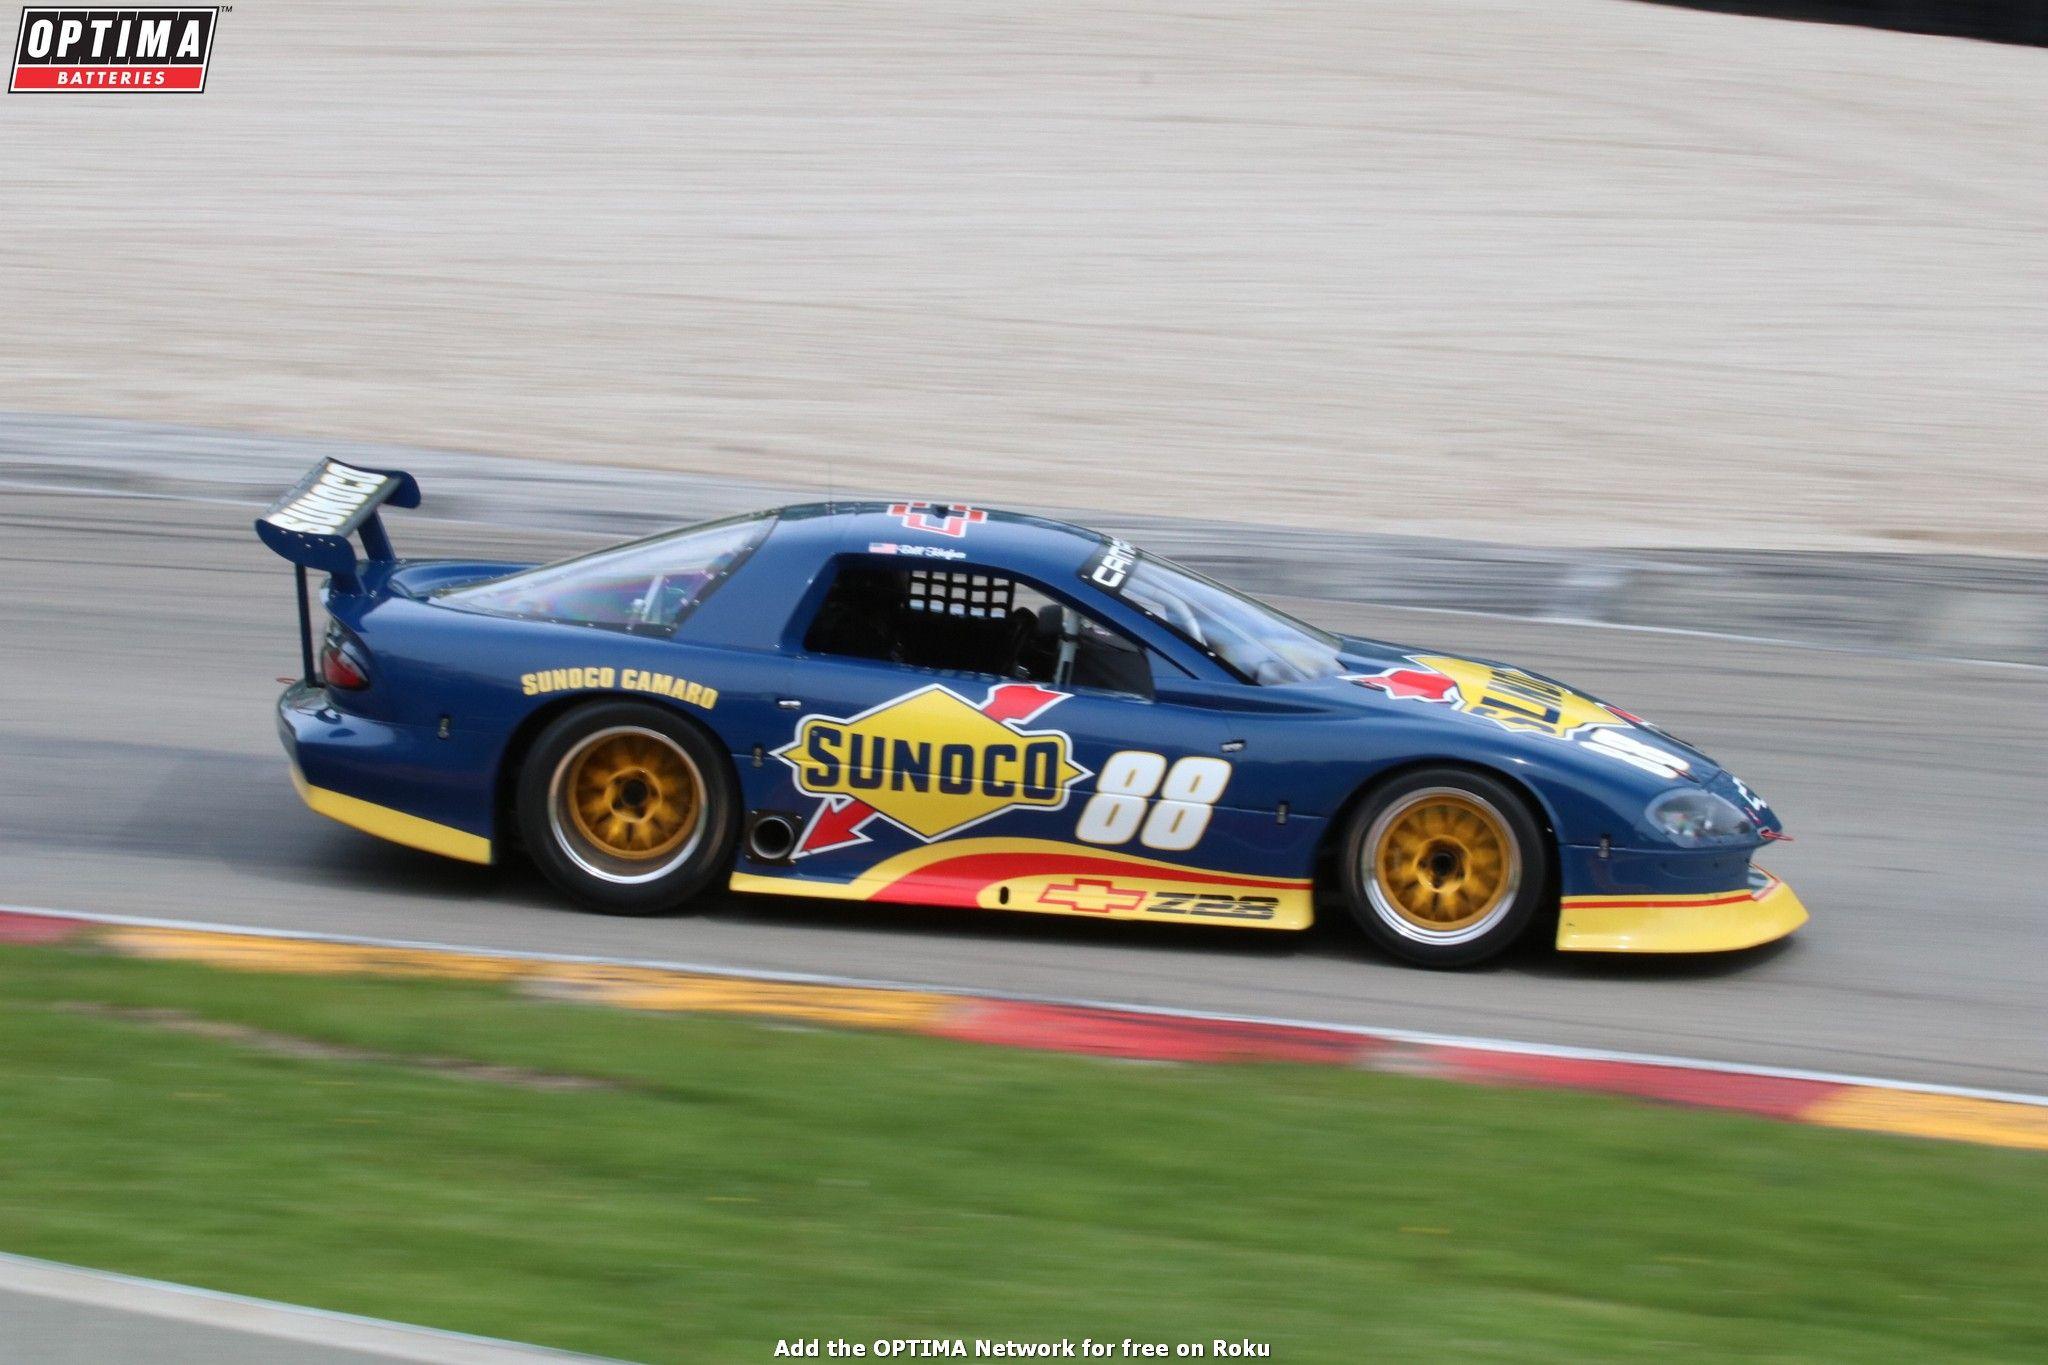 Bill Heffner's 1993 Sunoco #Camaro at the 2017 Spring #SVRA